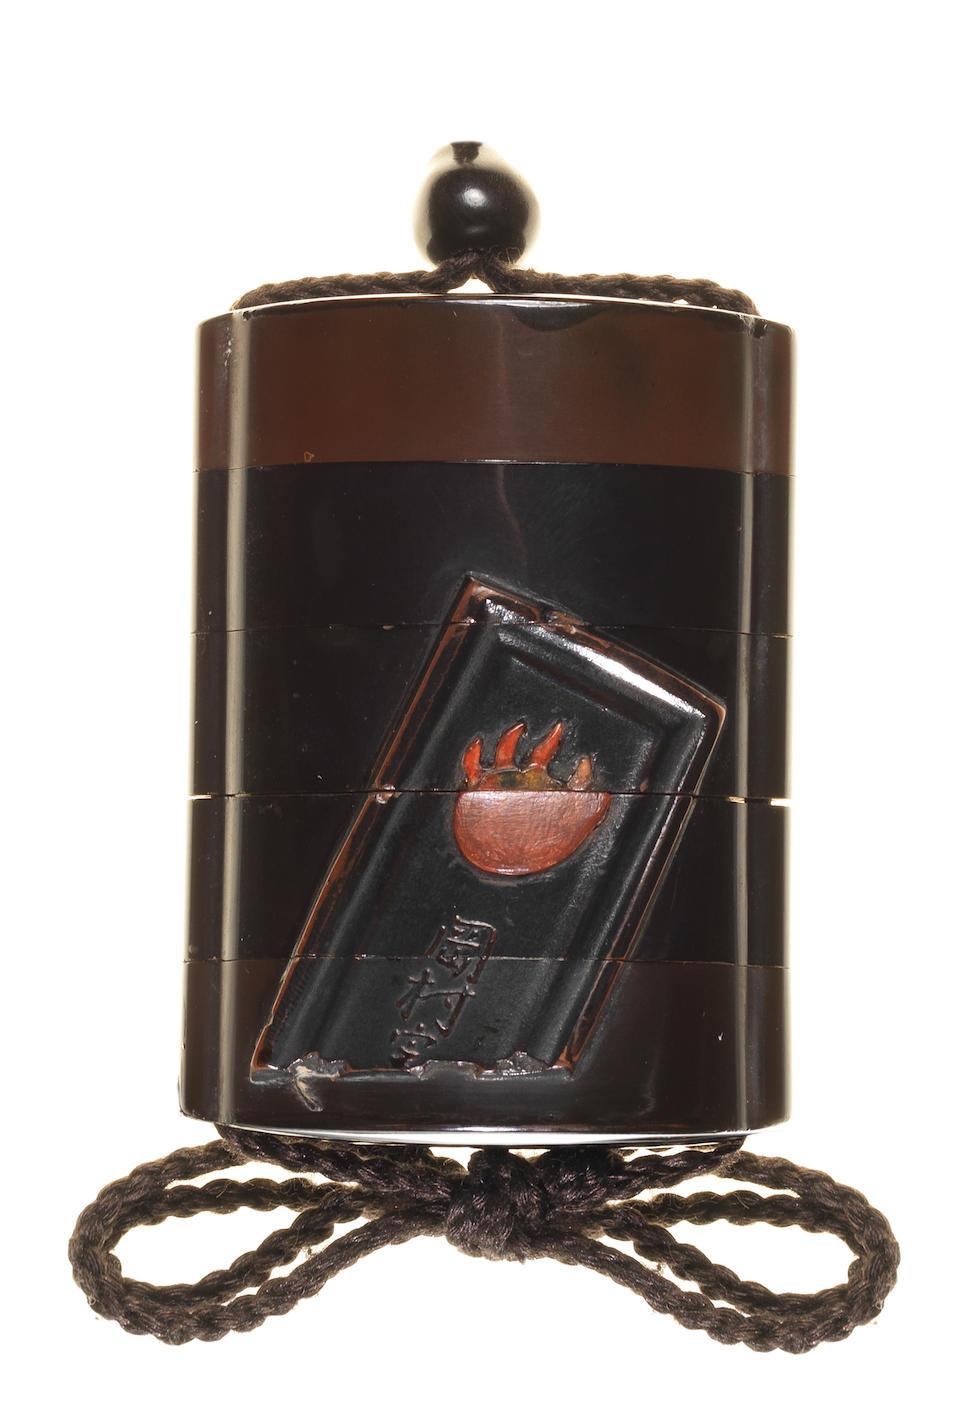 A black lacquer four-case inro 18th century